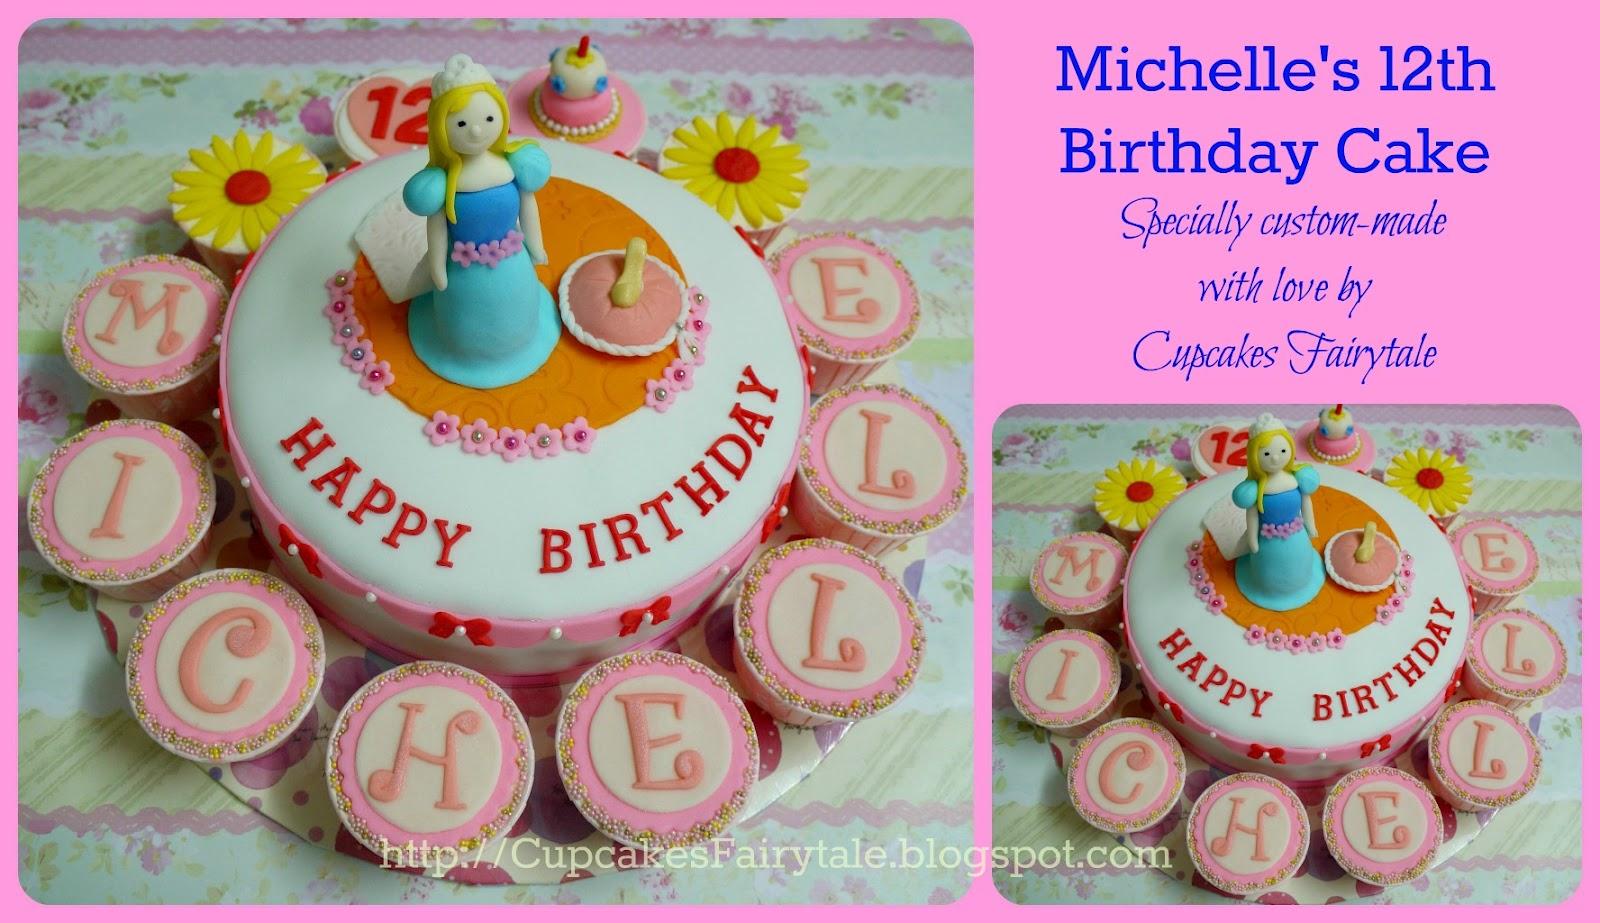 Cupcakes Fairytale Michelles 12th Birthday Cake